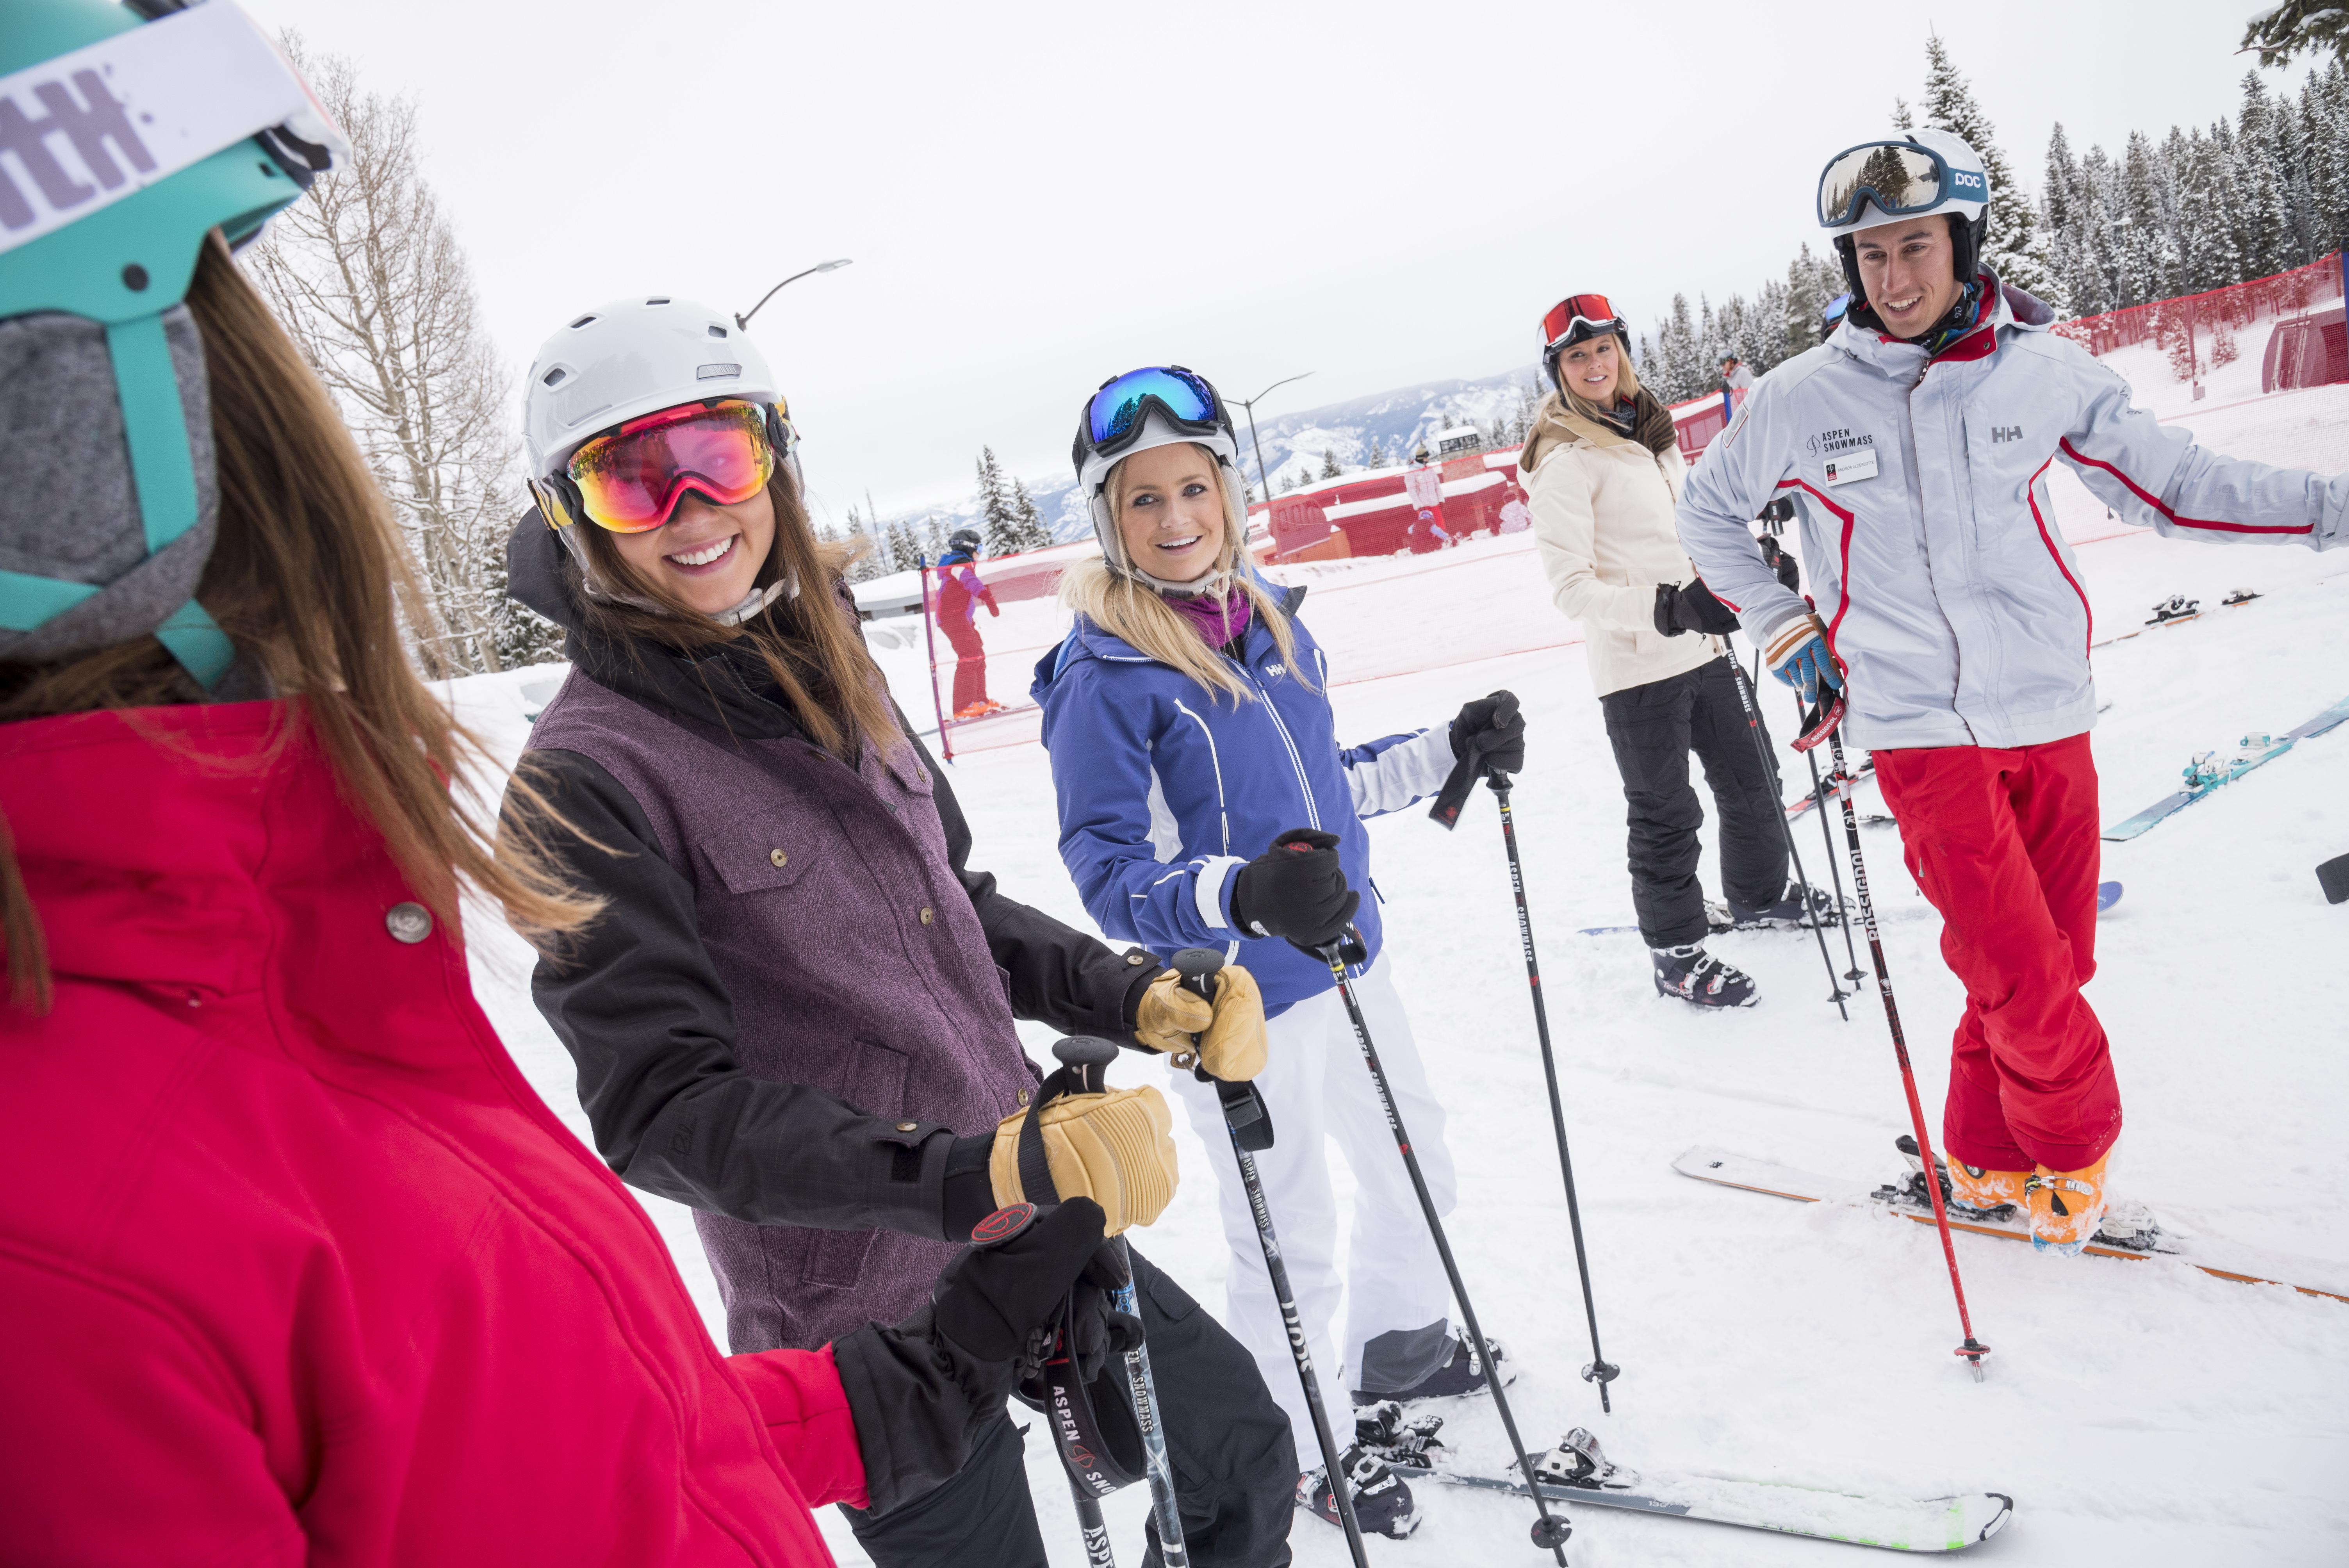 ski lessons at buttermilk aspen snowmass